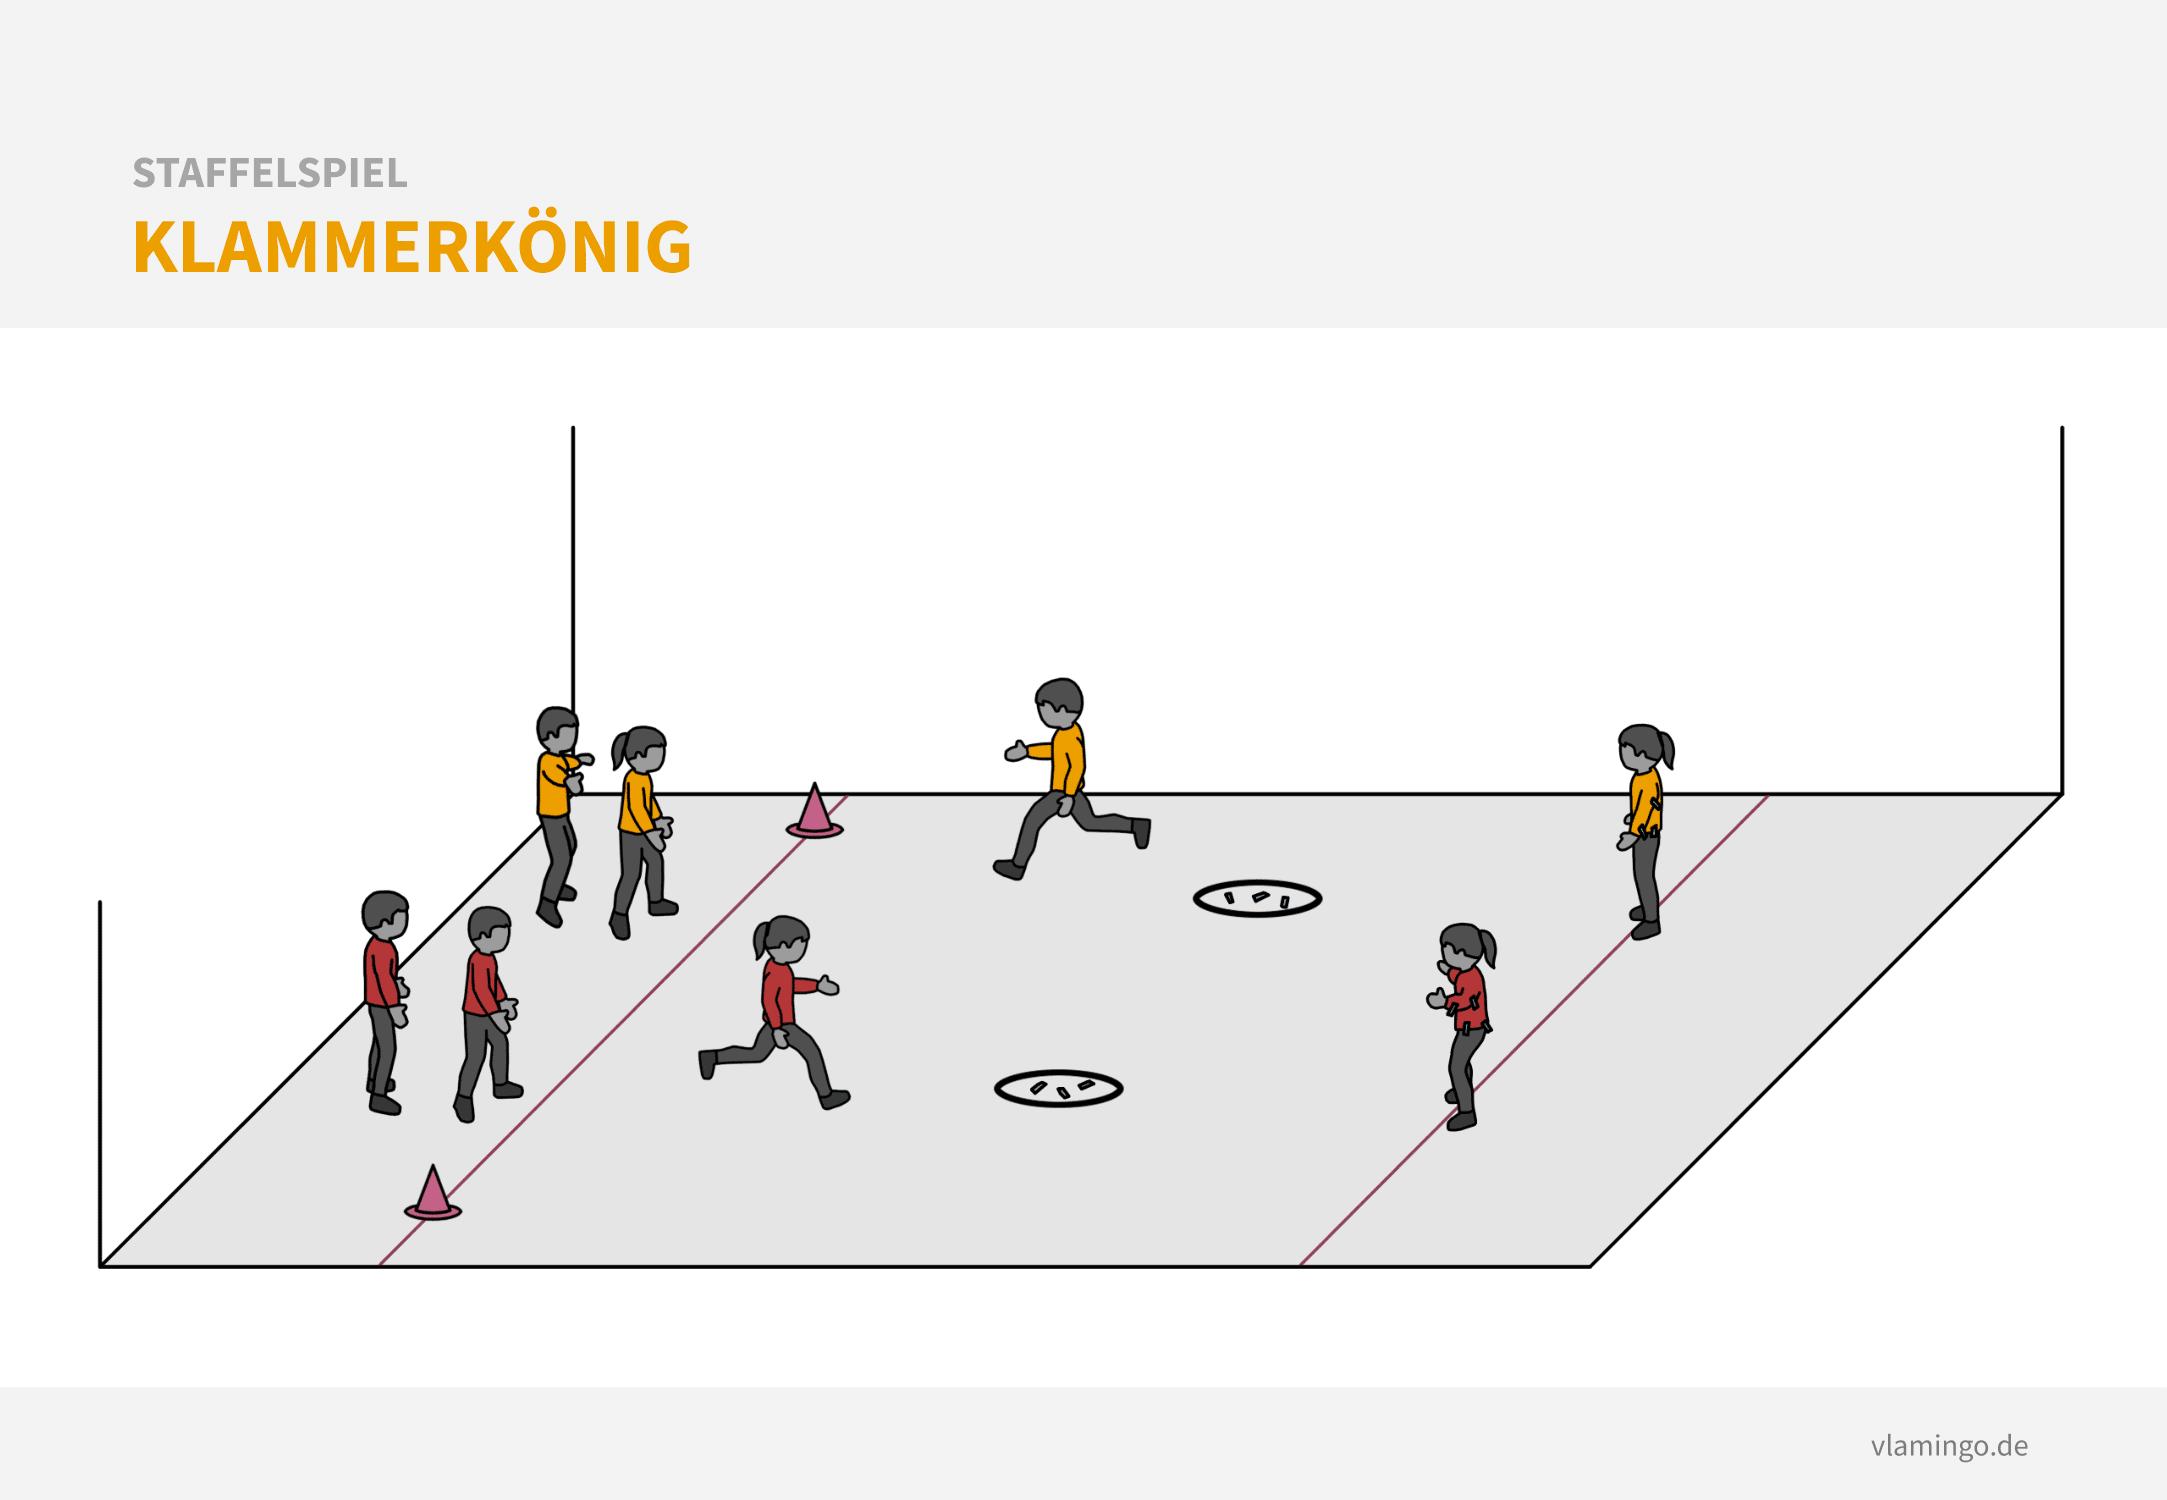 Staffelspiel - Klammerkönig